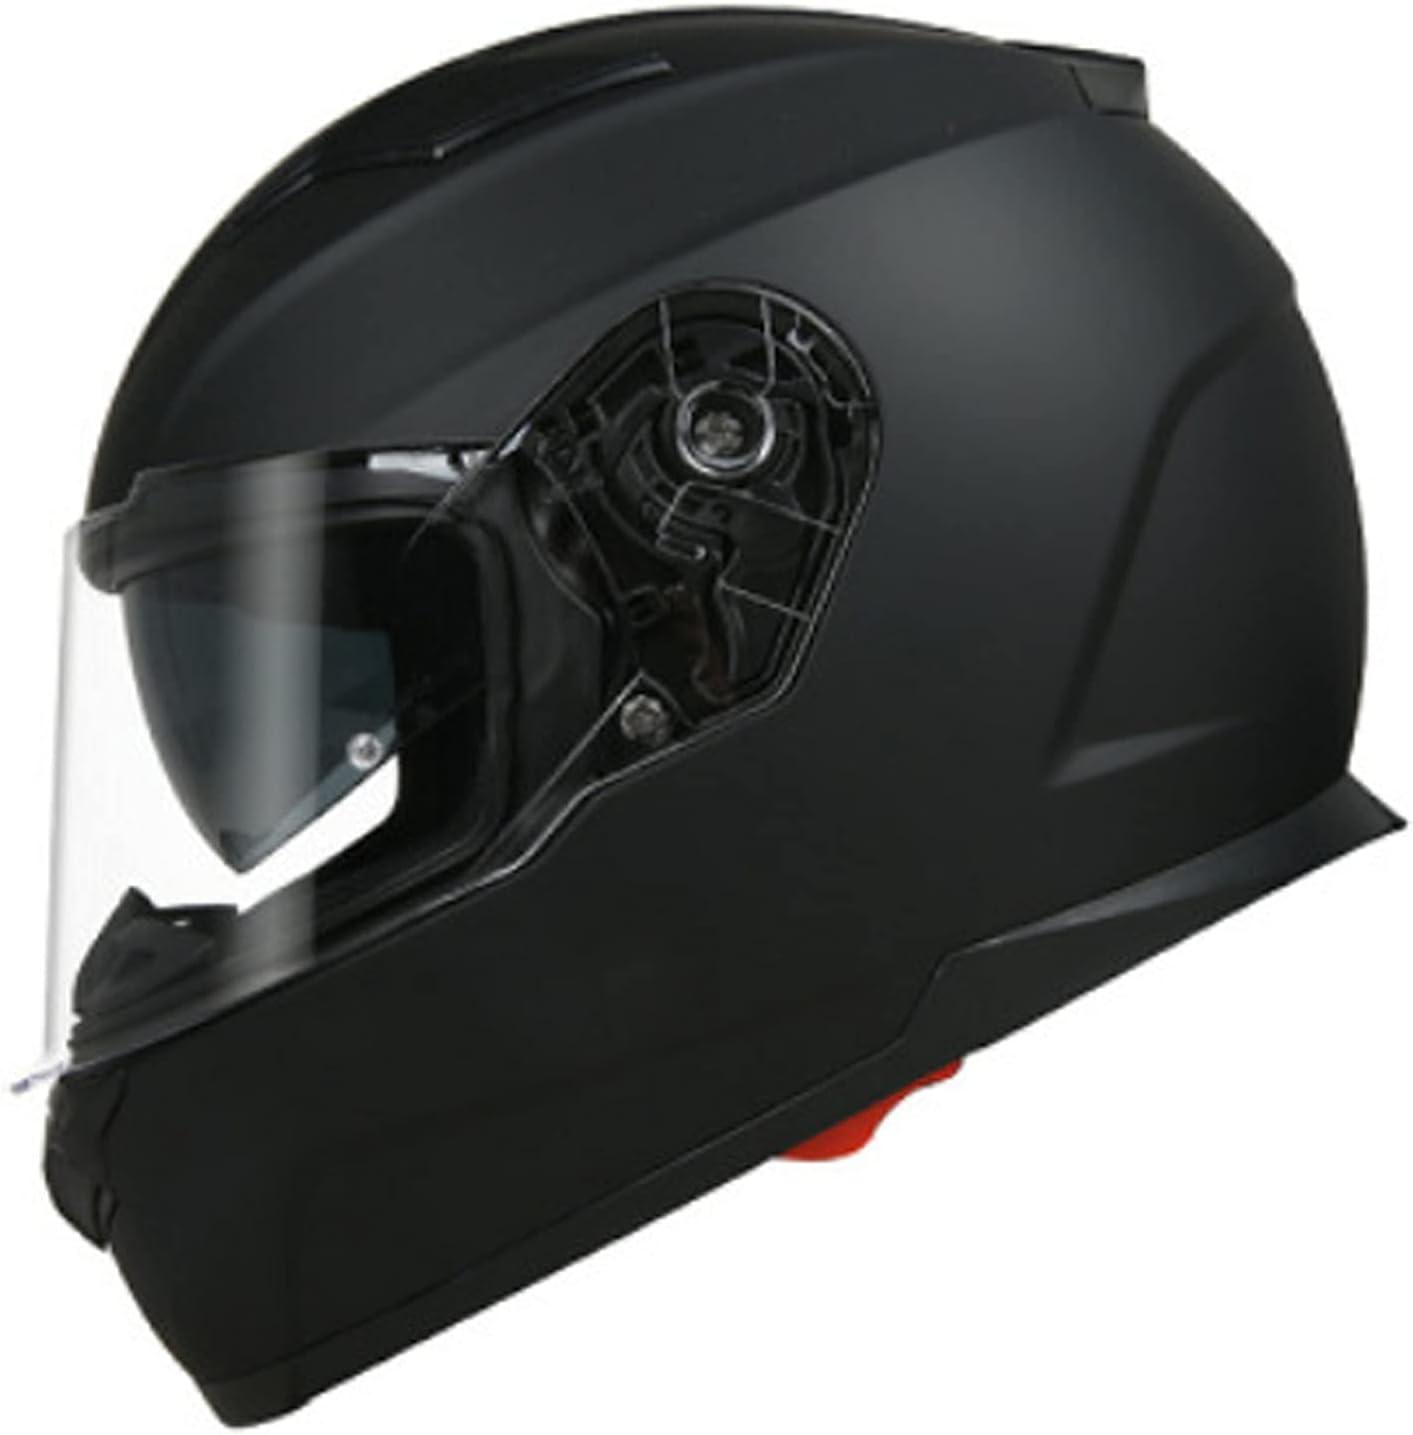 Flip Up sale Super sale Motorcycle Helmet Modular Full Adult Wom Men Face